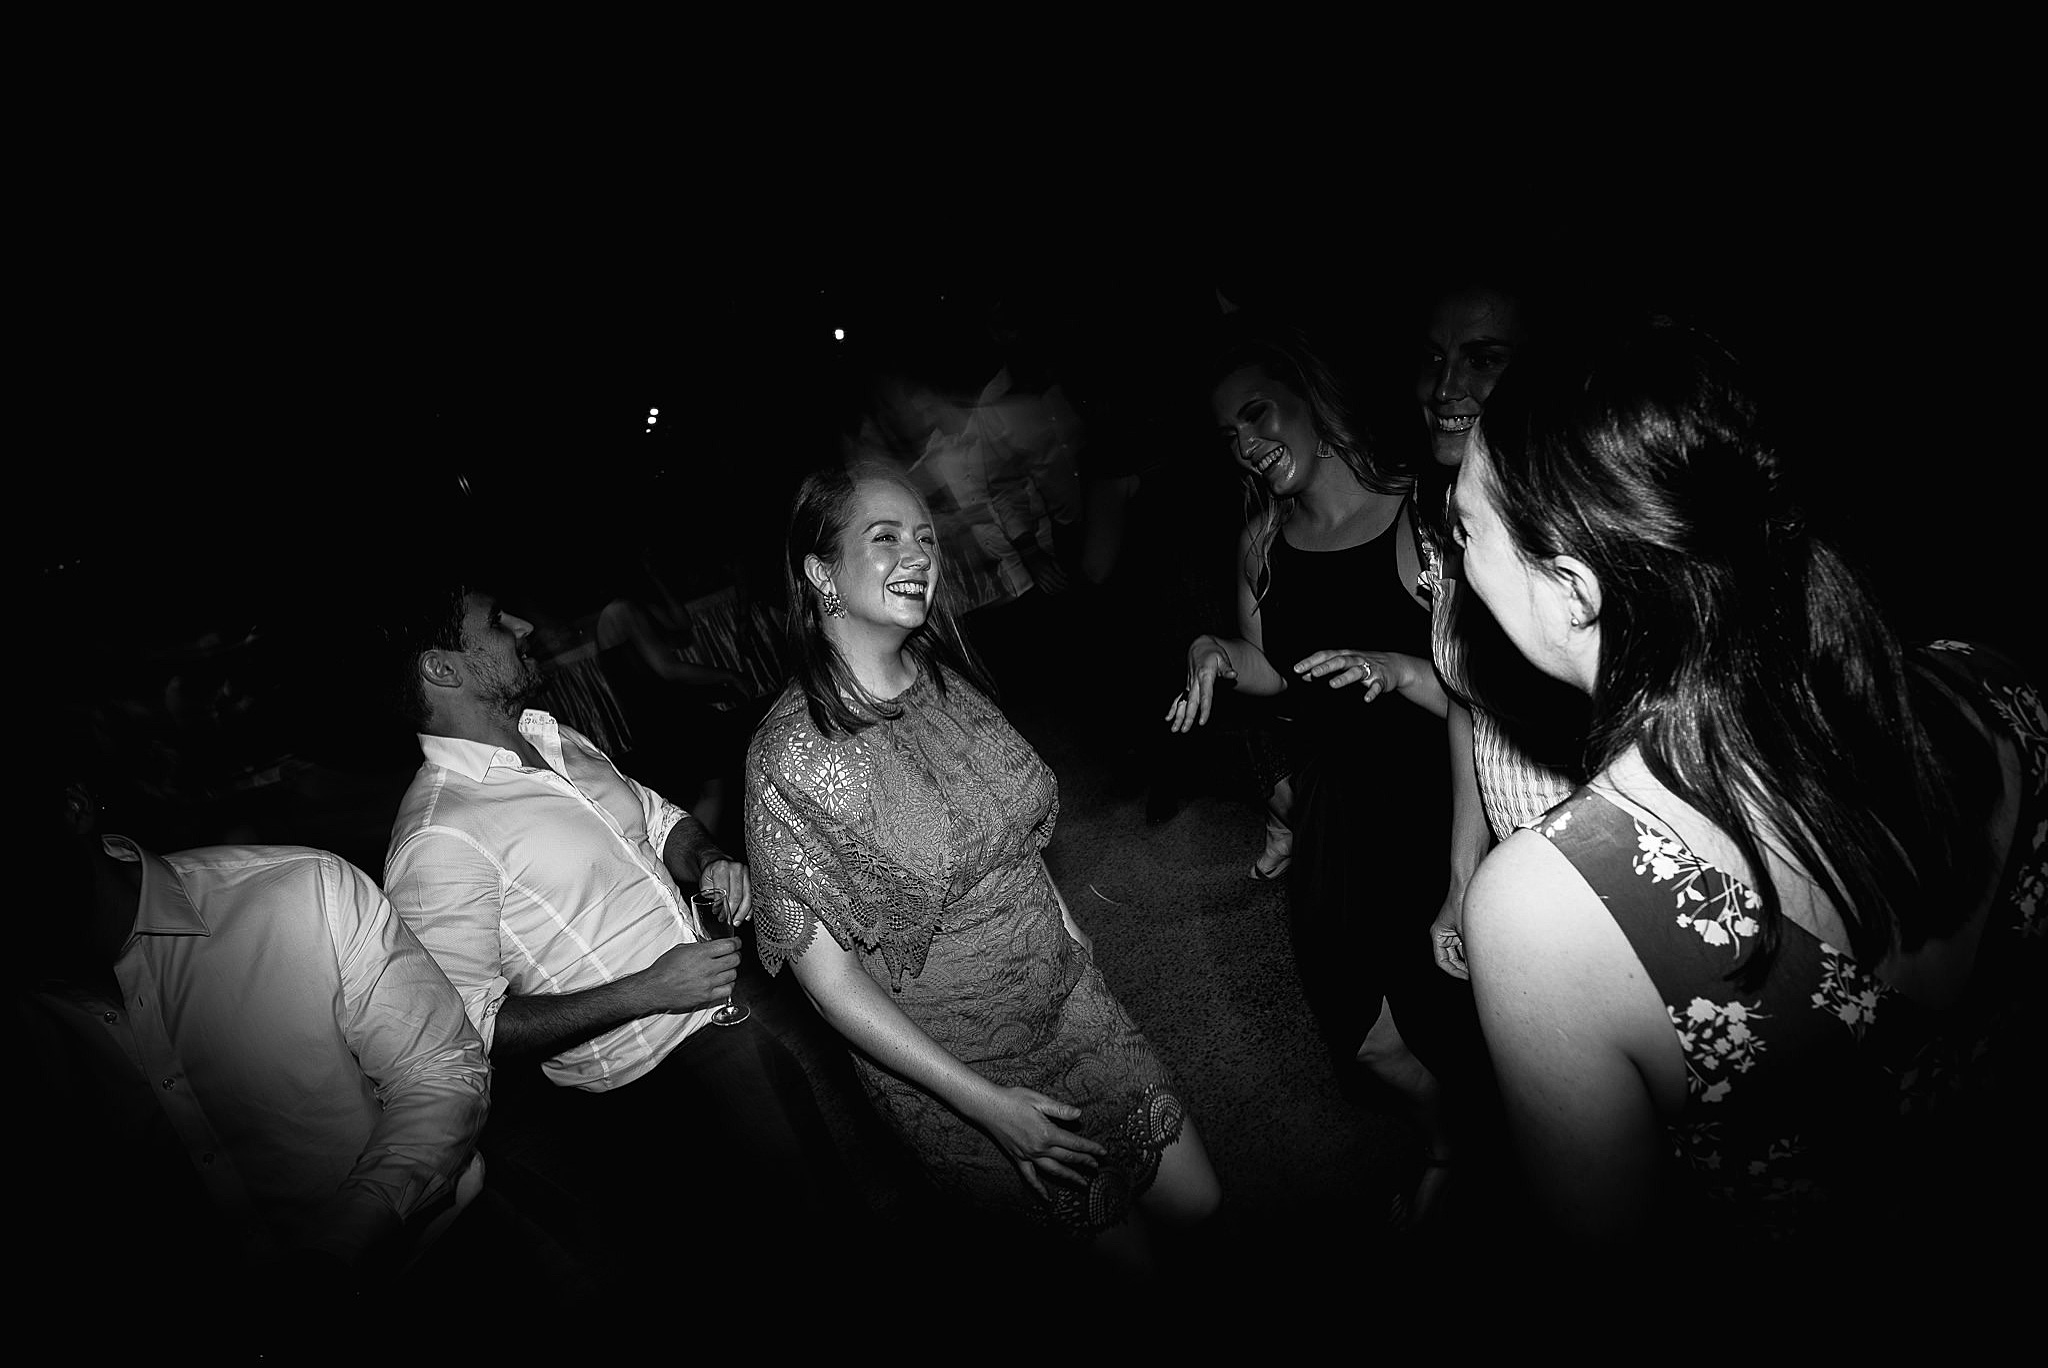 Barton flower bar,Keepsakephoto by the Keeffes,ACT wedding photographer,ACT weddings,canberra wedding,Canberra Wedding Photographer,Canberra Wedding Photography,canberra weddings,Cork Forest Canberra,destination wedding,National Arboretum Canberra,canberra florist,